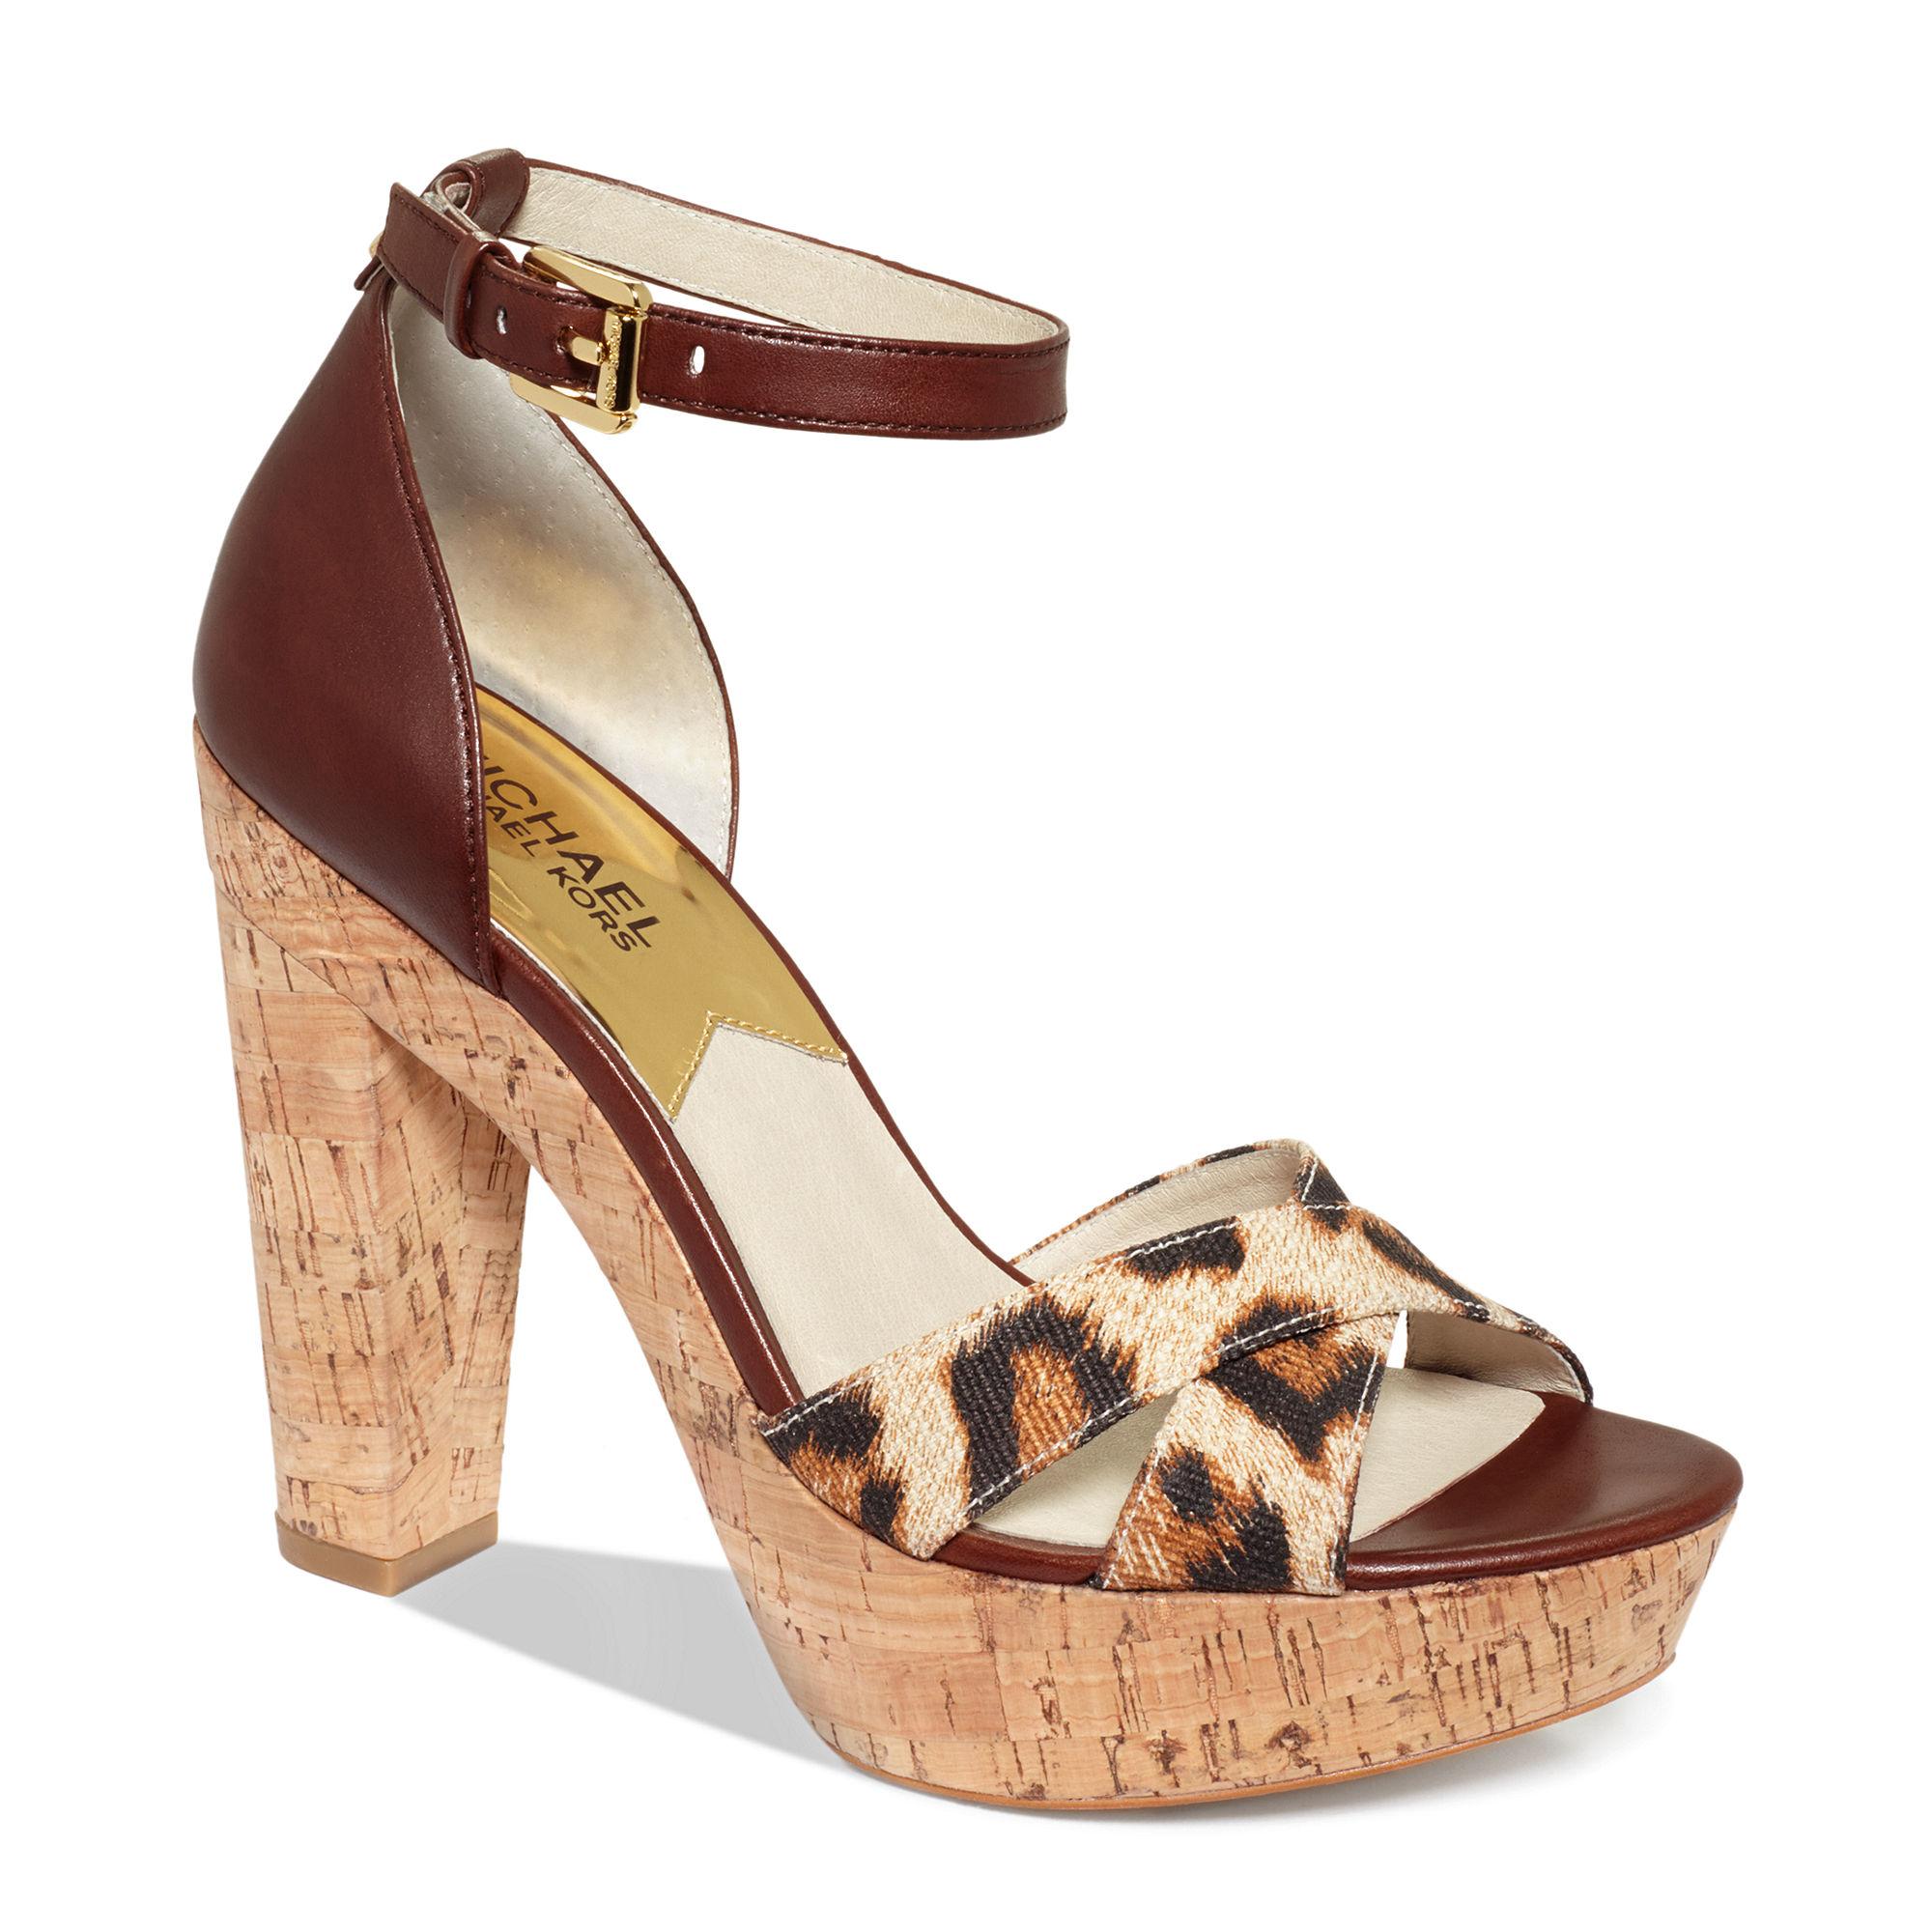 9b9665559e6d Platform Sandals  Michael Kors Sandals Platform